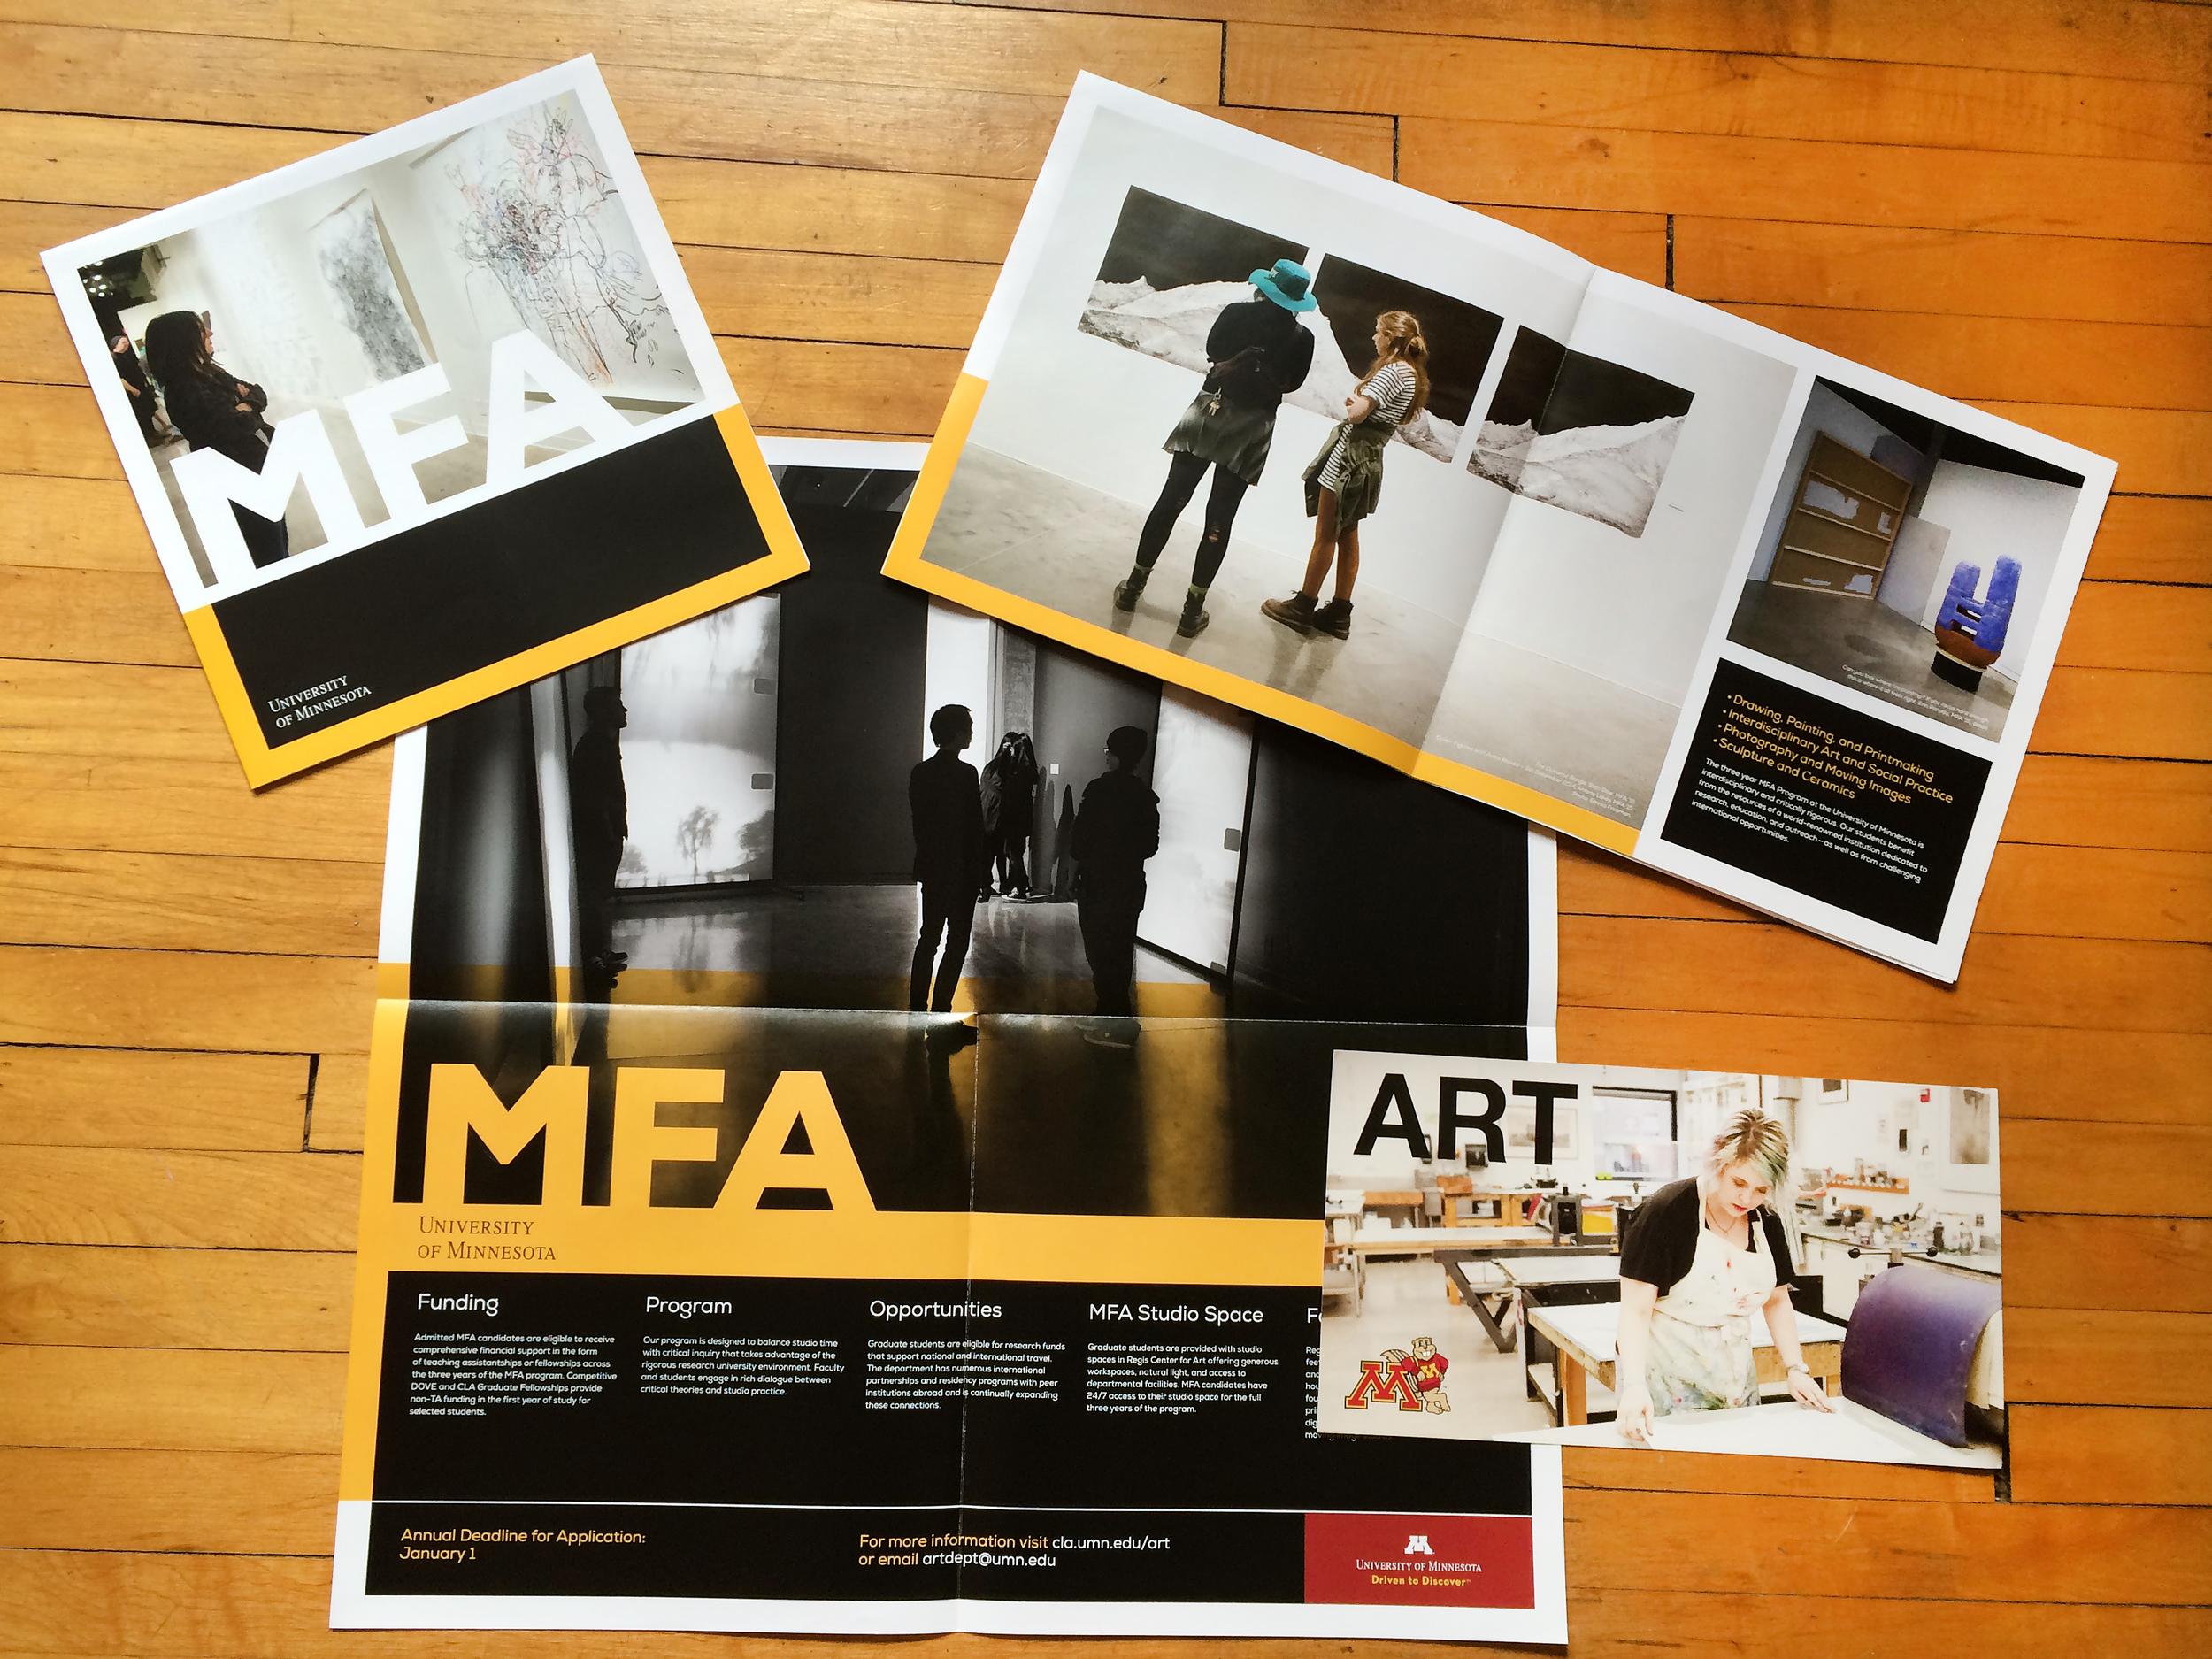 University of Minnesota Marketing Pieces